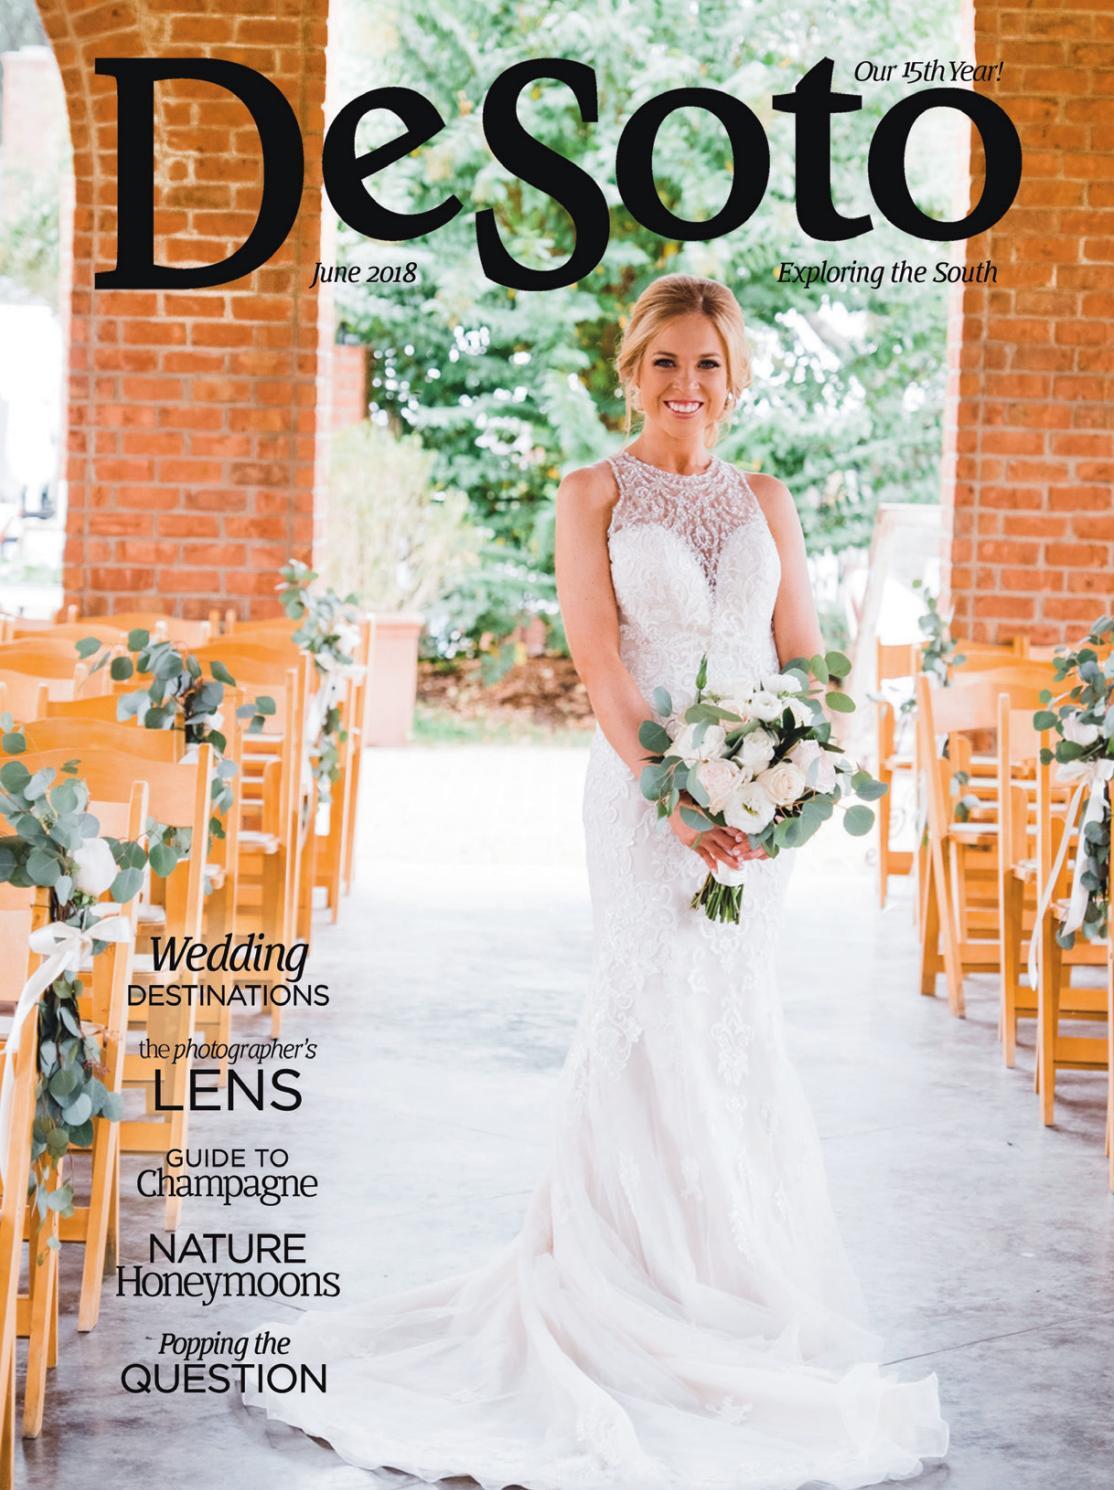 Desoto Magazine June 2018 By Desoto Magazine Exploring The South